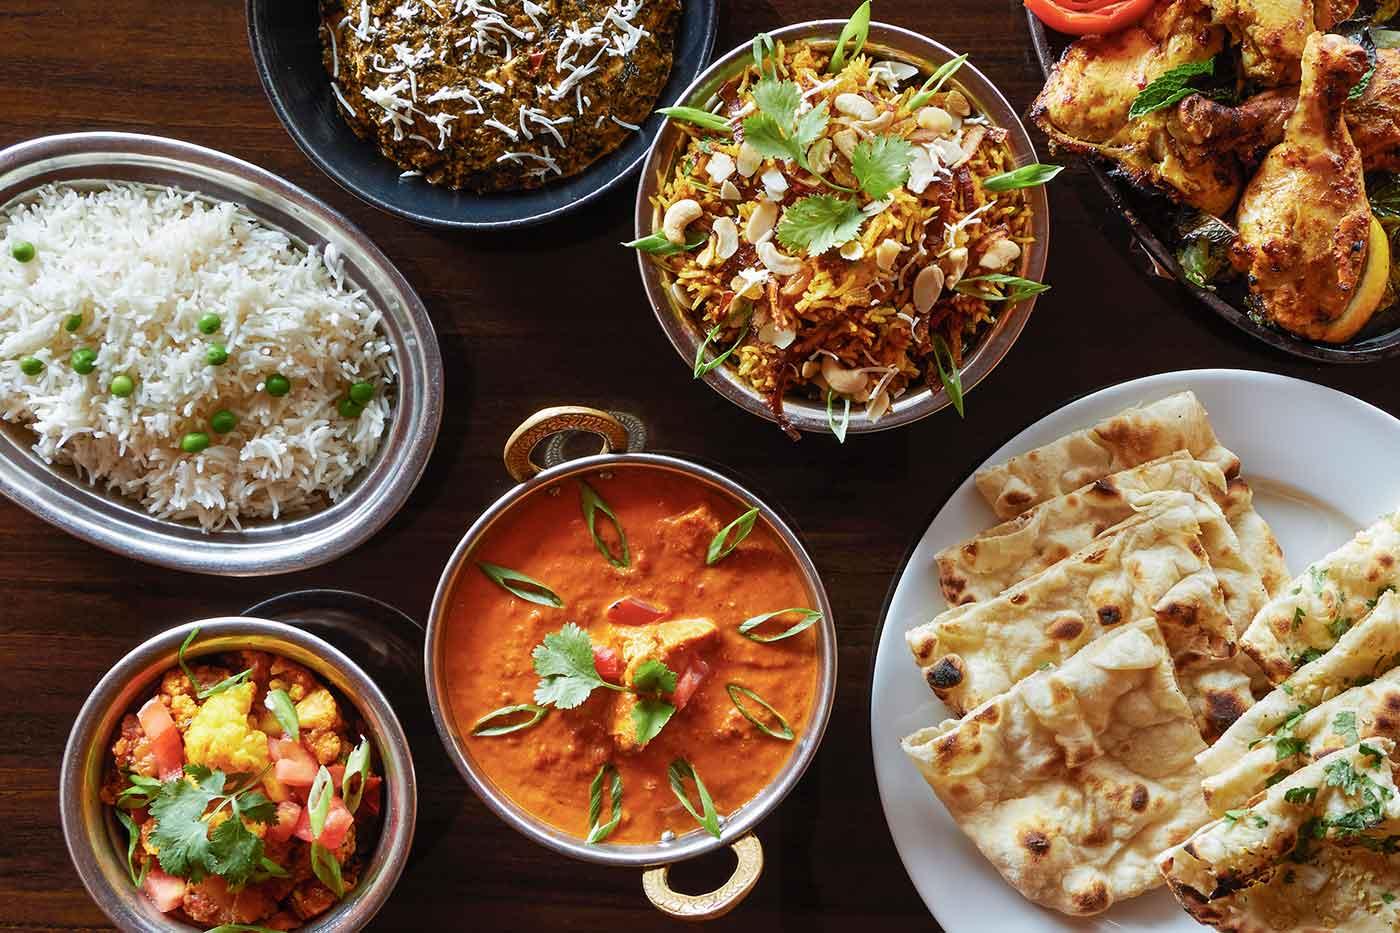 Indian Restaurant Franchise For Sale Nj Pa Ny De Va Md Oh Vt Nh